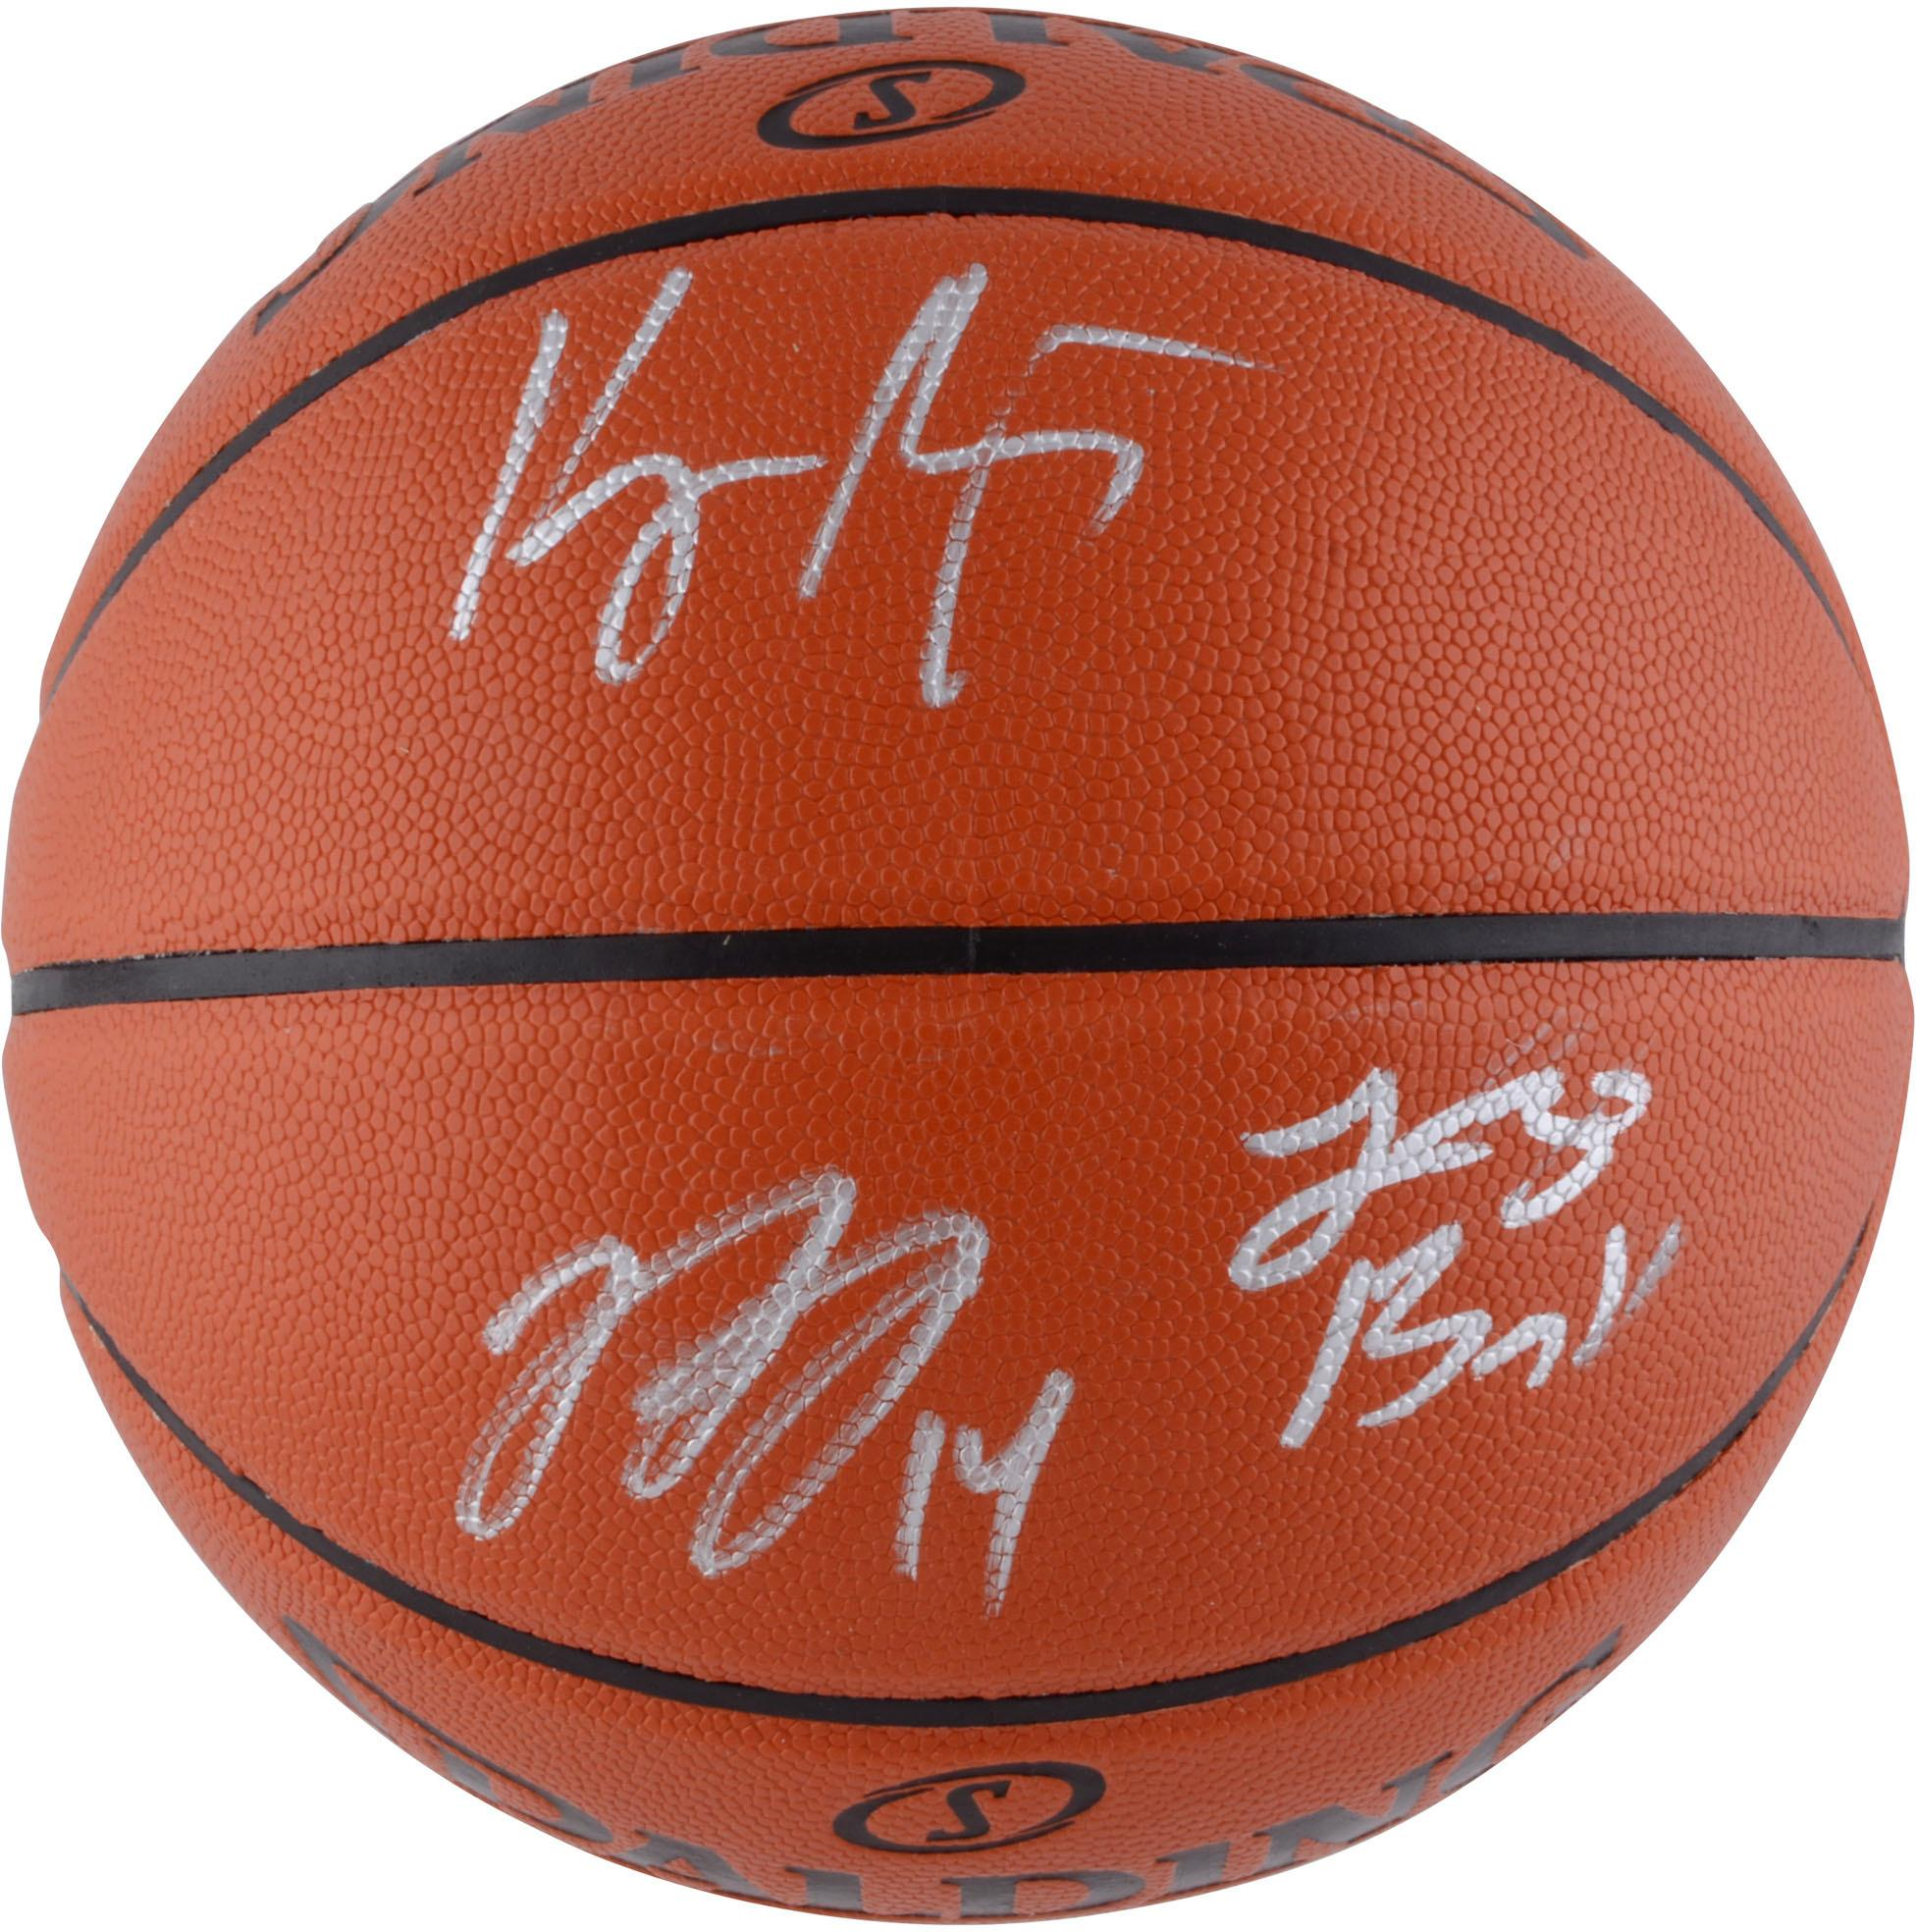 Lonzo Ball, Brandon Ingram, Kyle Kuzma Los Angeles Lakers Autographed Indoor/Outdoor Basketball - Fanatics Authentic Certified